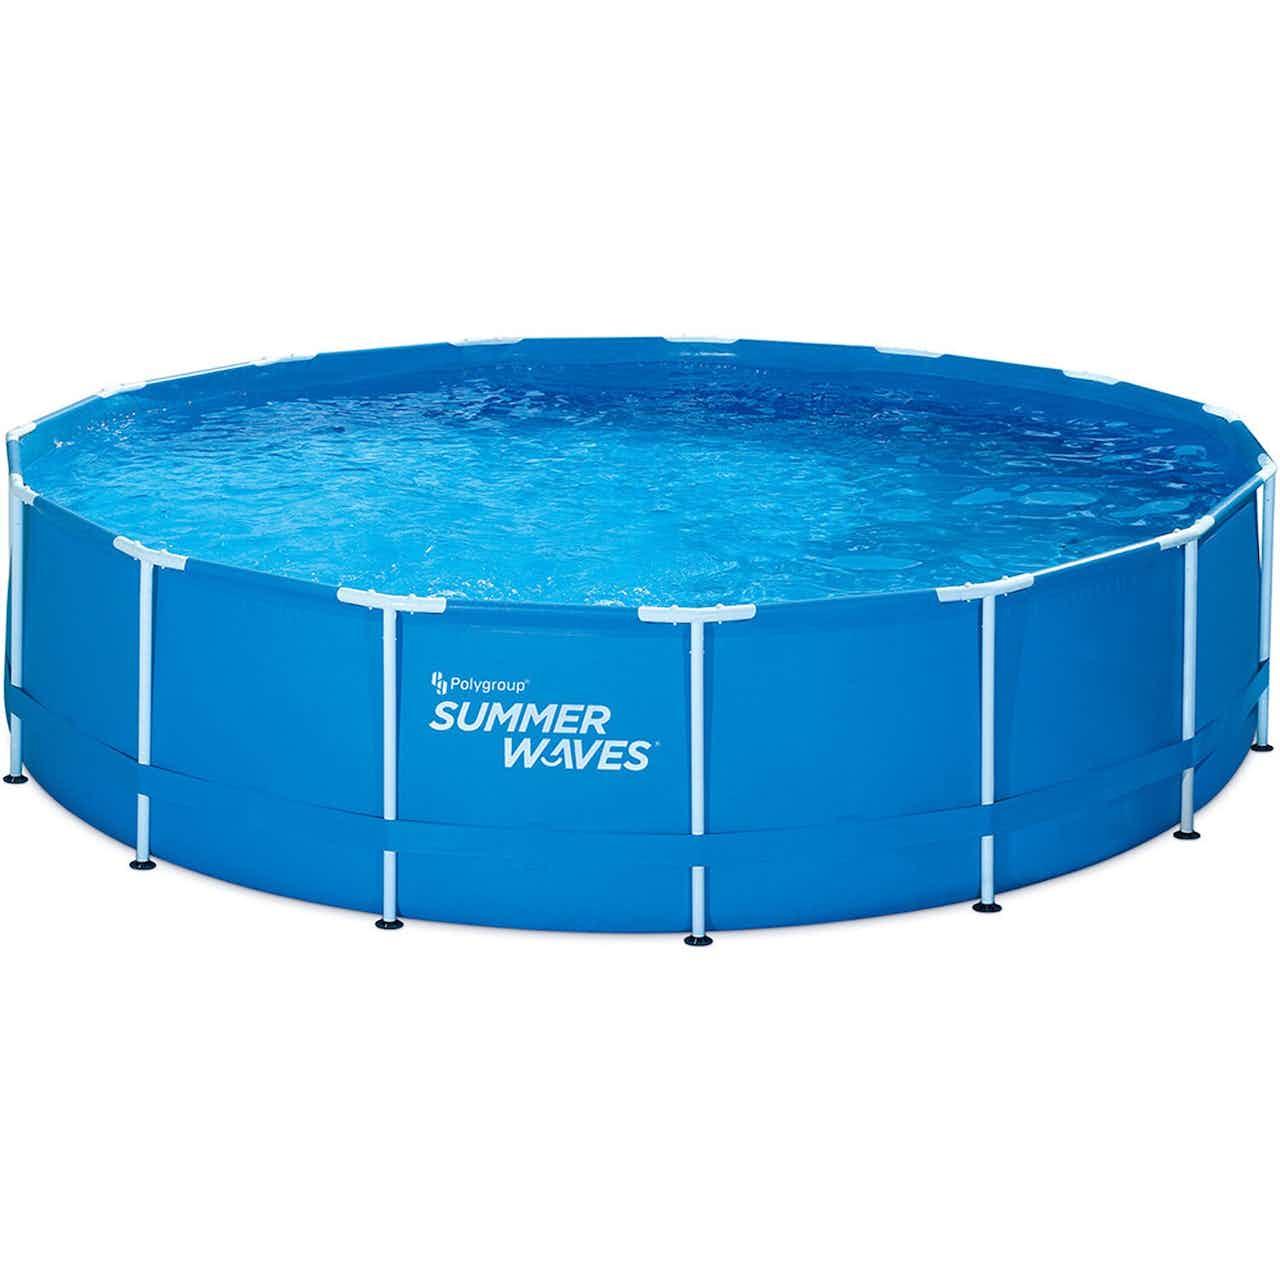 Summer Waves Active Frame Pool Blau-Weiß 244x76 cm